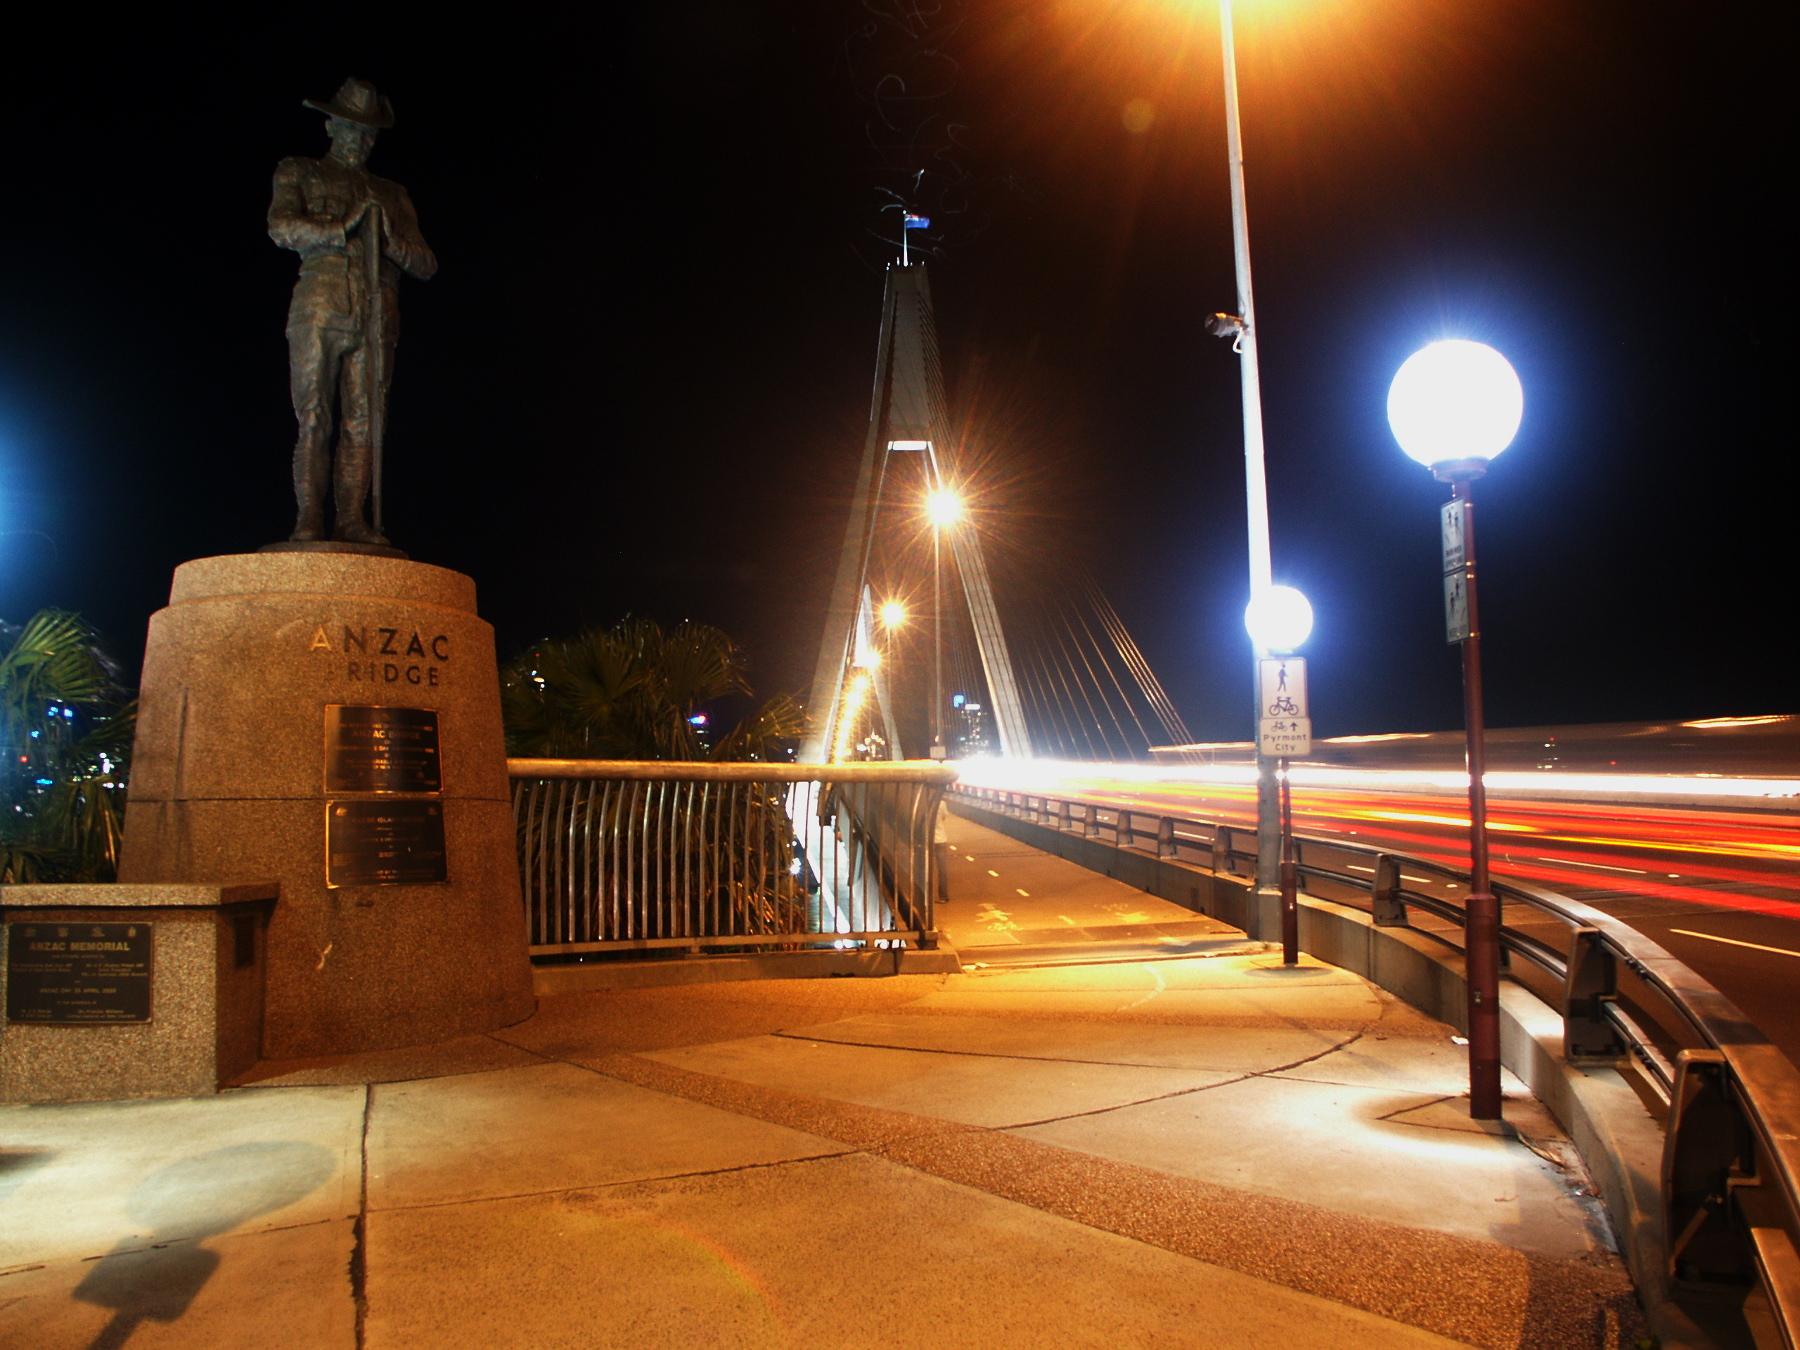 Installation of Anzac Digger on Anzac Bridge